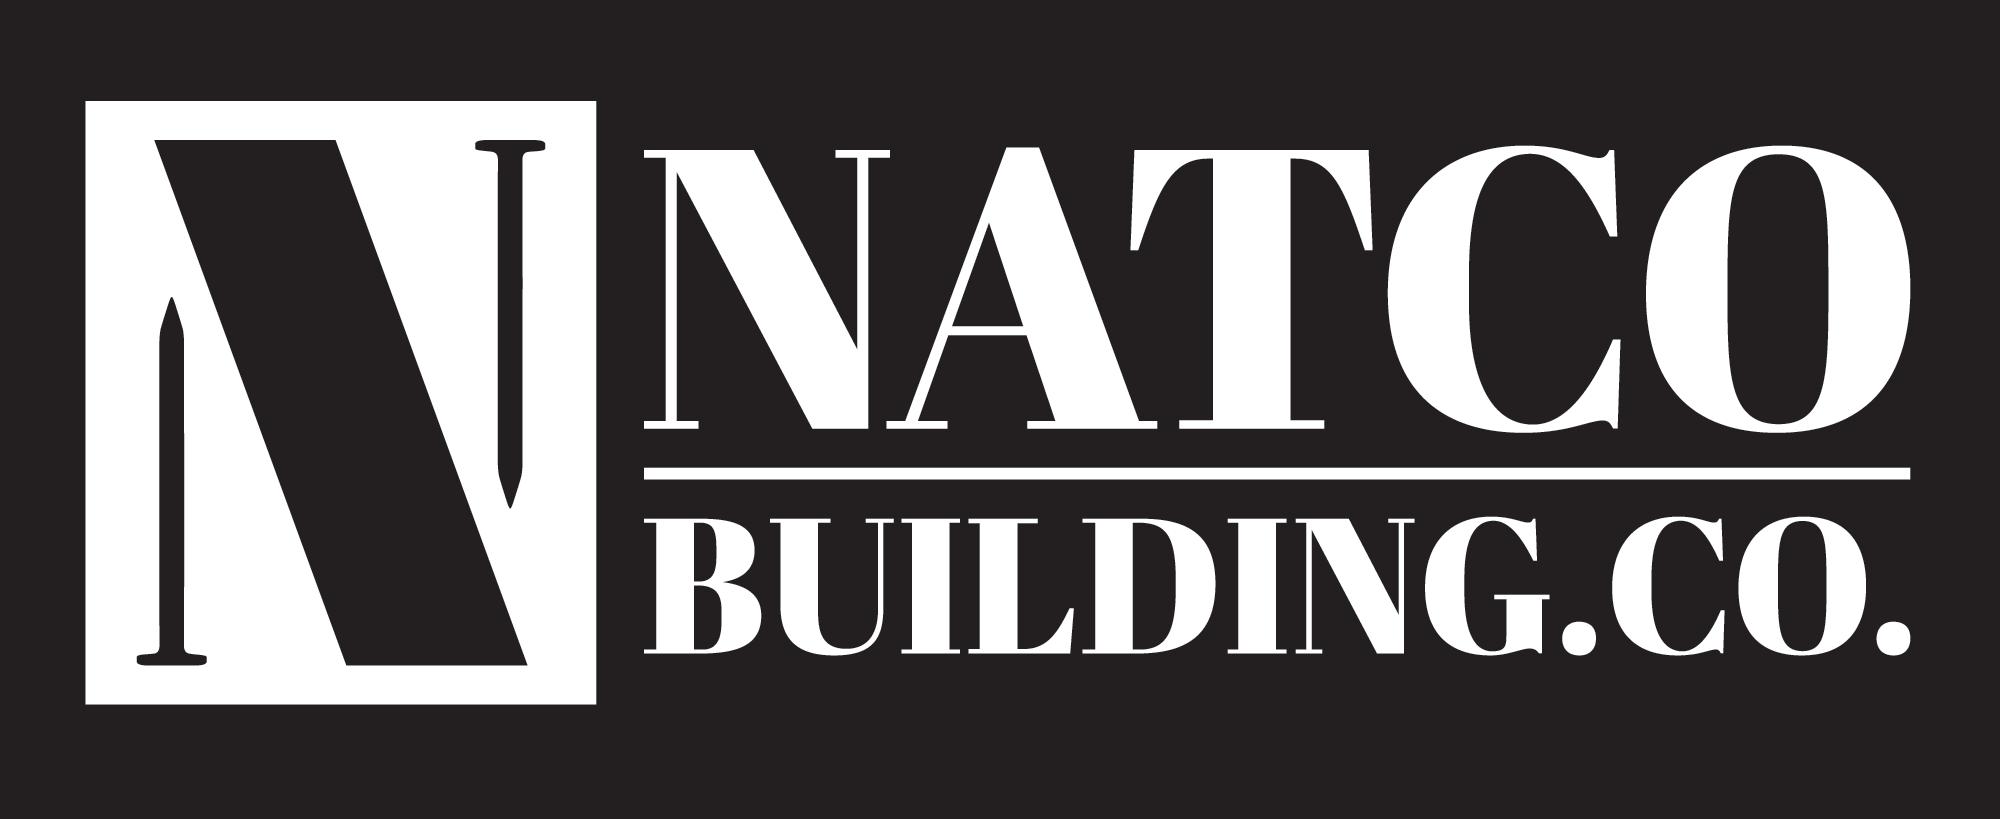 Natco Building Company, LLC